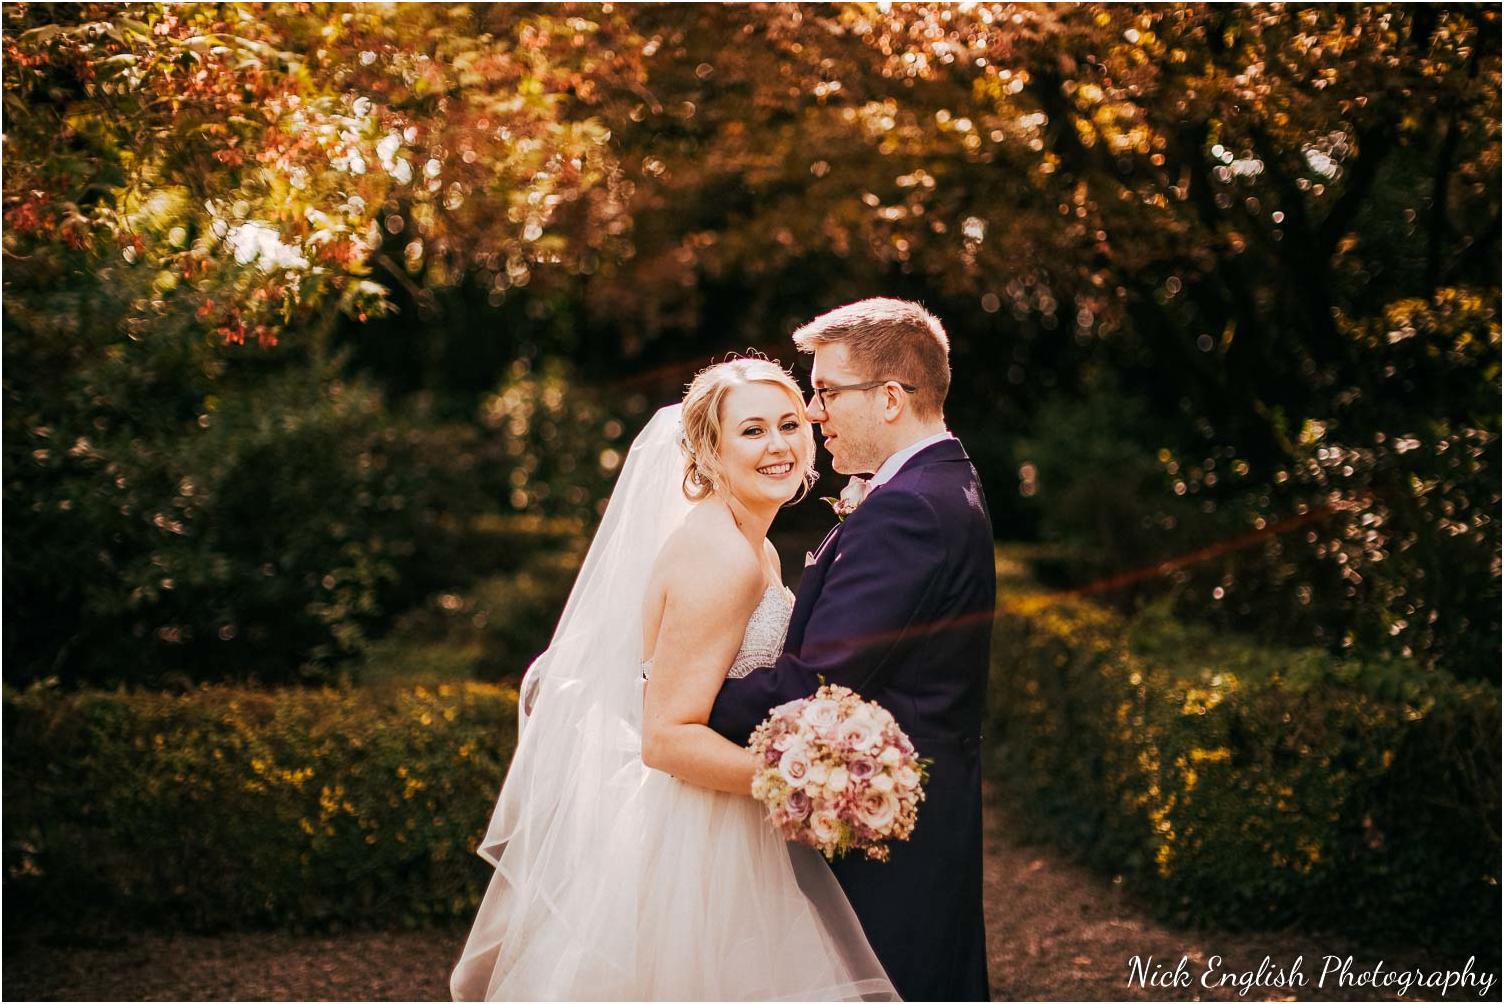 Eaves_Hall_Wedding_Photographer-62.jpg